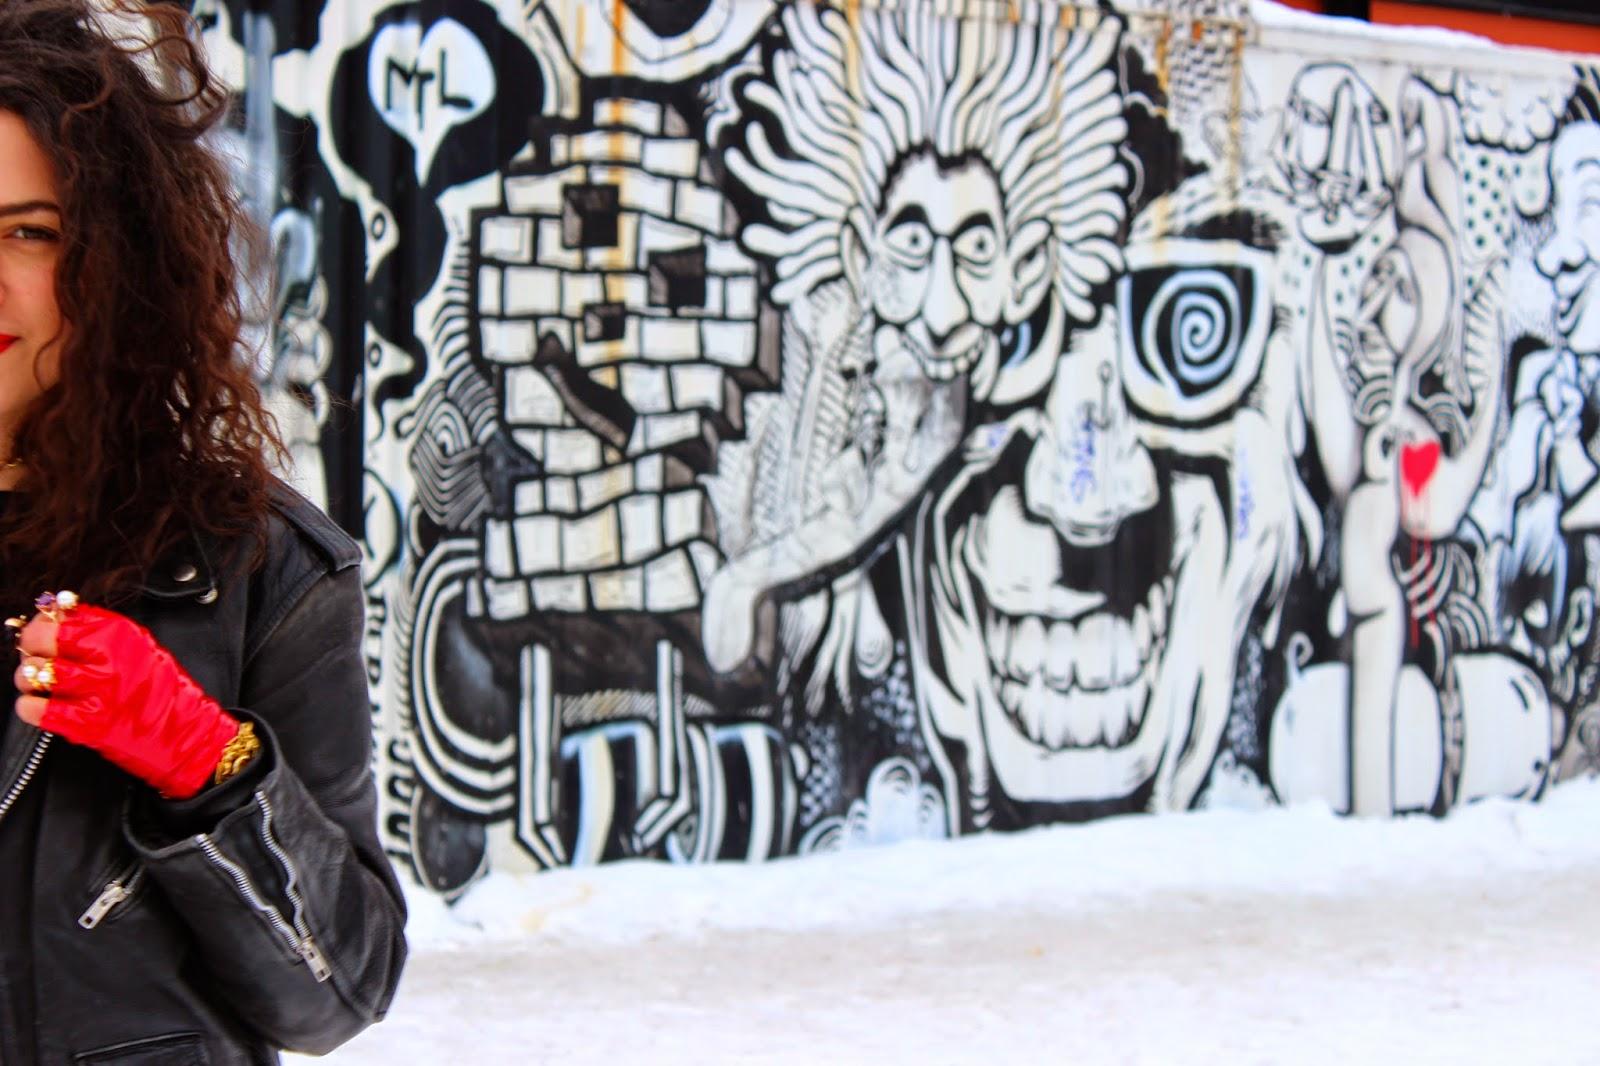 dulcedo agency editorial boutique montreal st laurent street art mural festival metro station gisele ganne jewellery crusader  editorial london fashion week